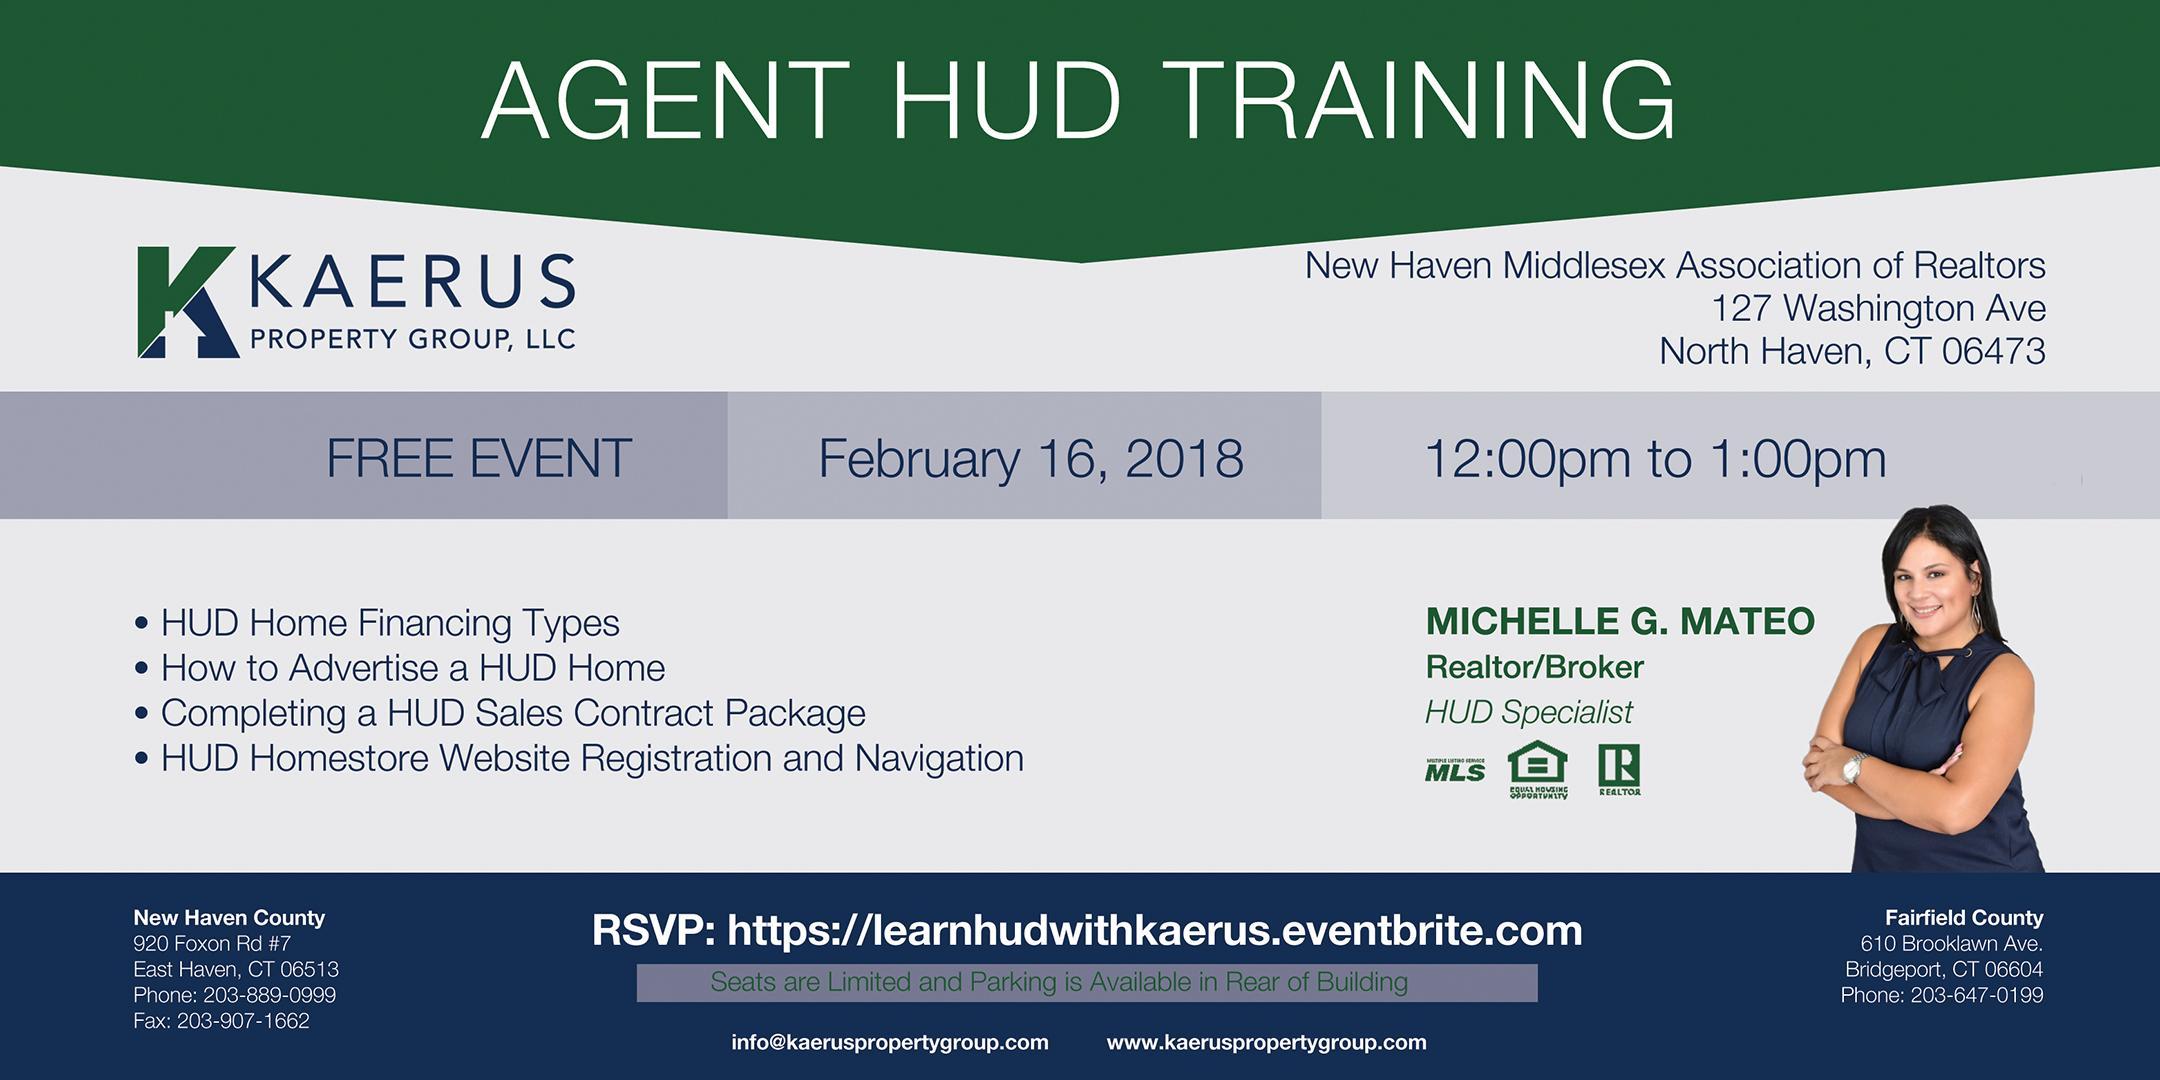 Agent Hud Training 16 Mar 2018